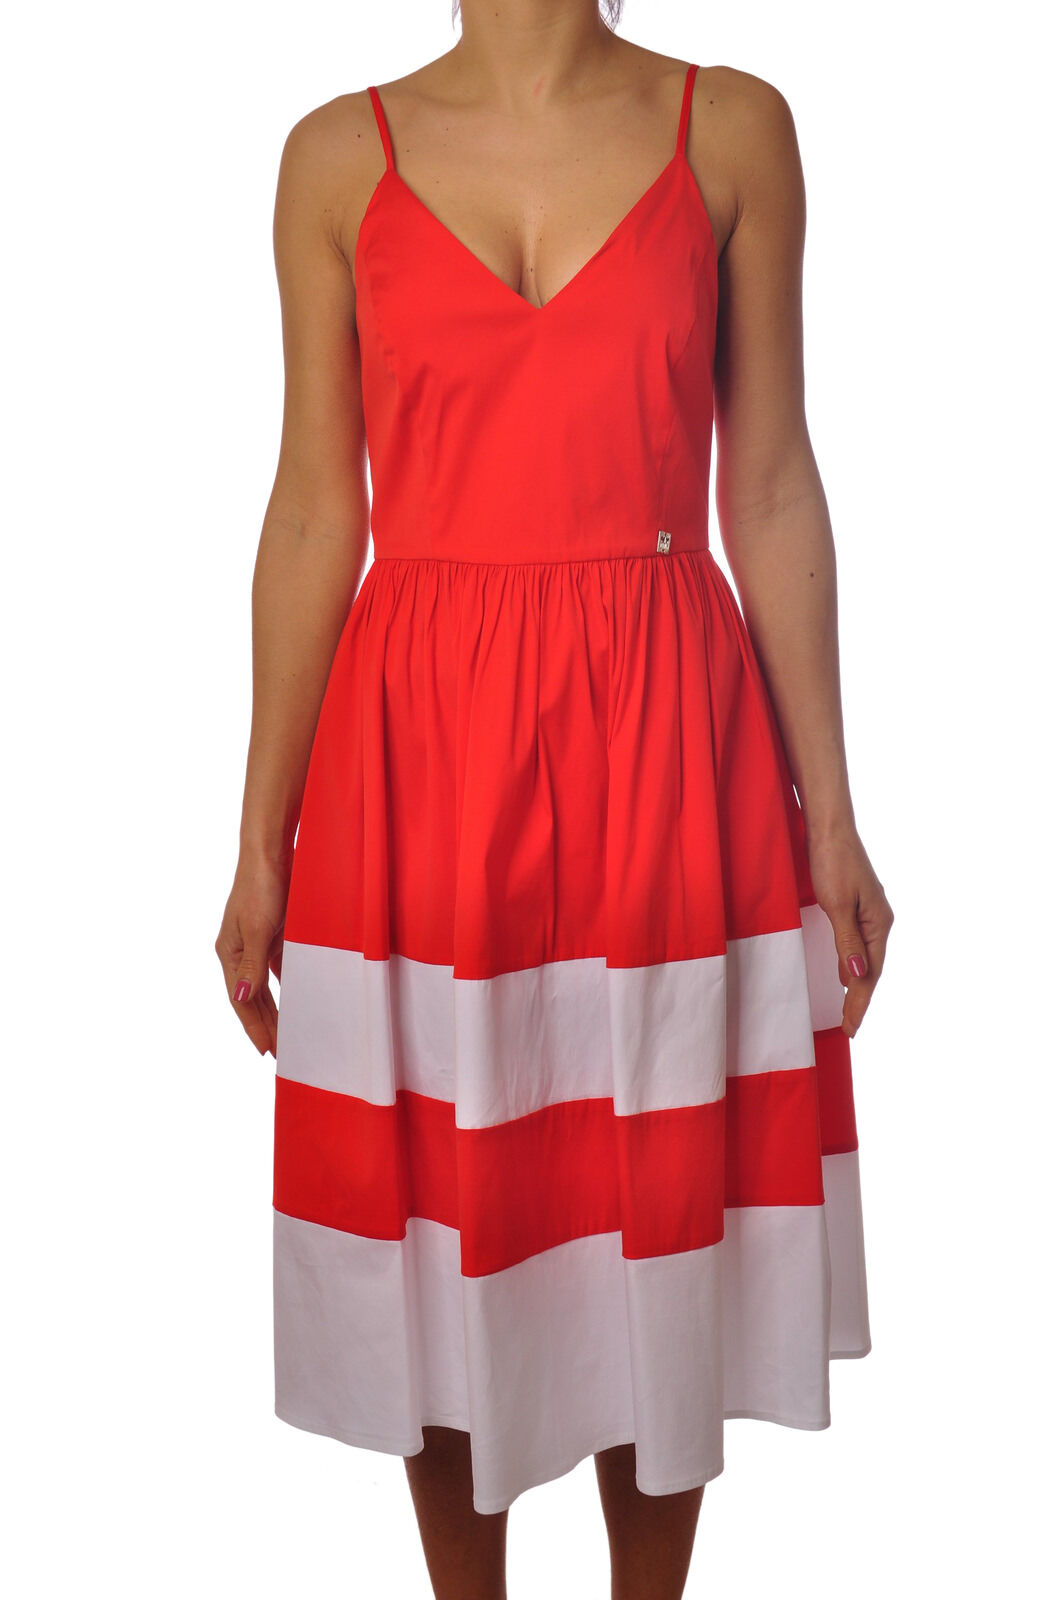 Twin Set - Dresses-Dress - Woman - Red - 5125510H185035